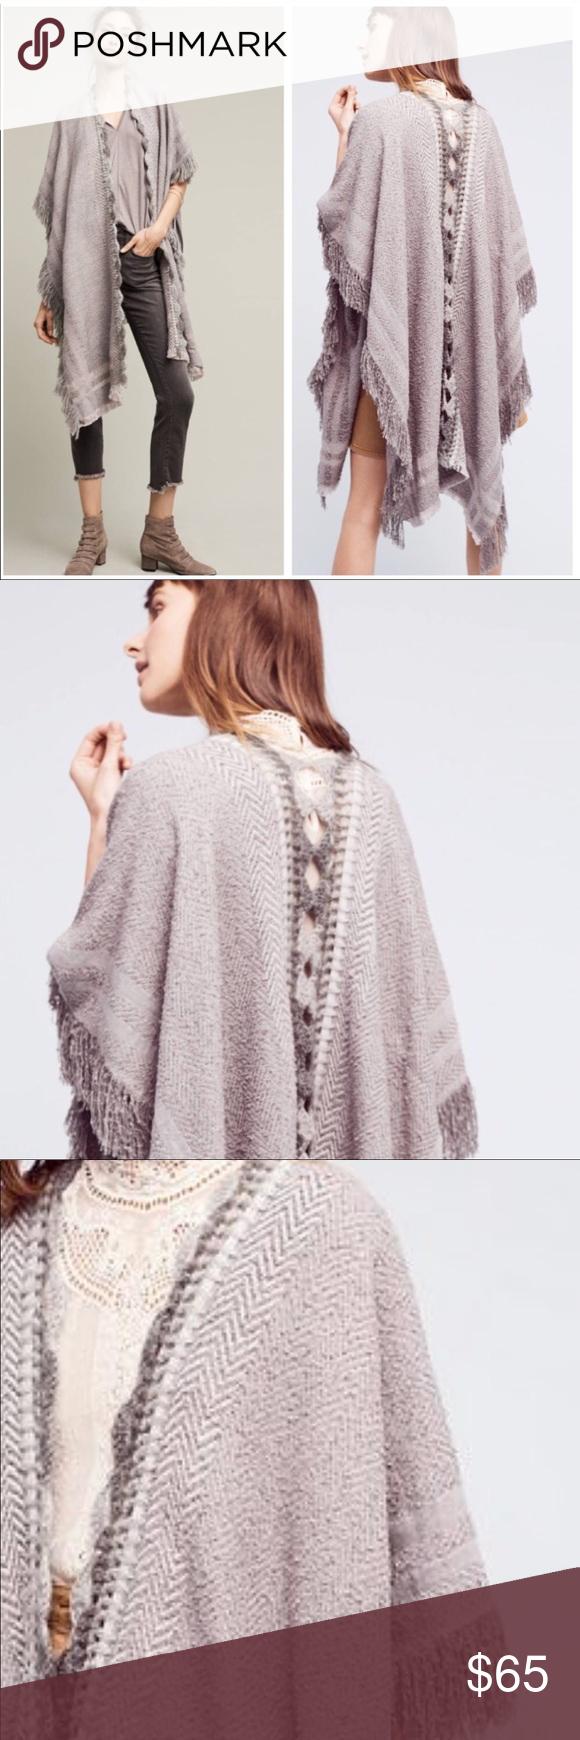 Anthropologie Montreux Kimono Top Fringe Shawl Poncho Grey One Size XS S M L